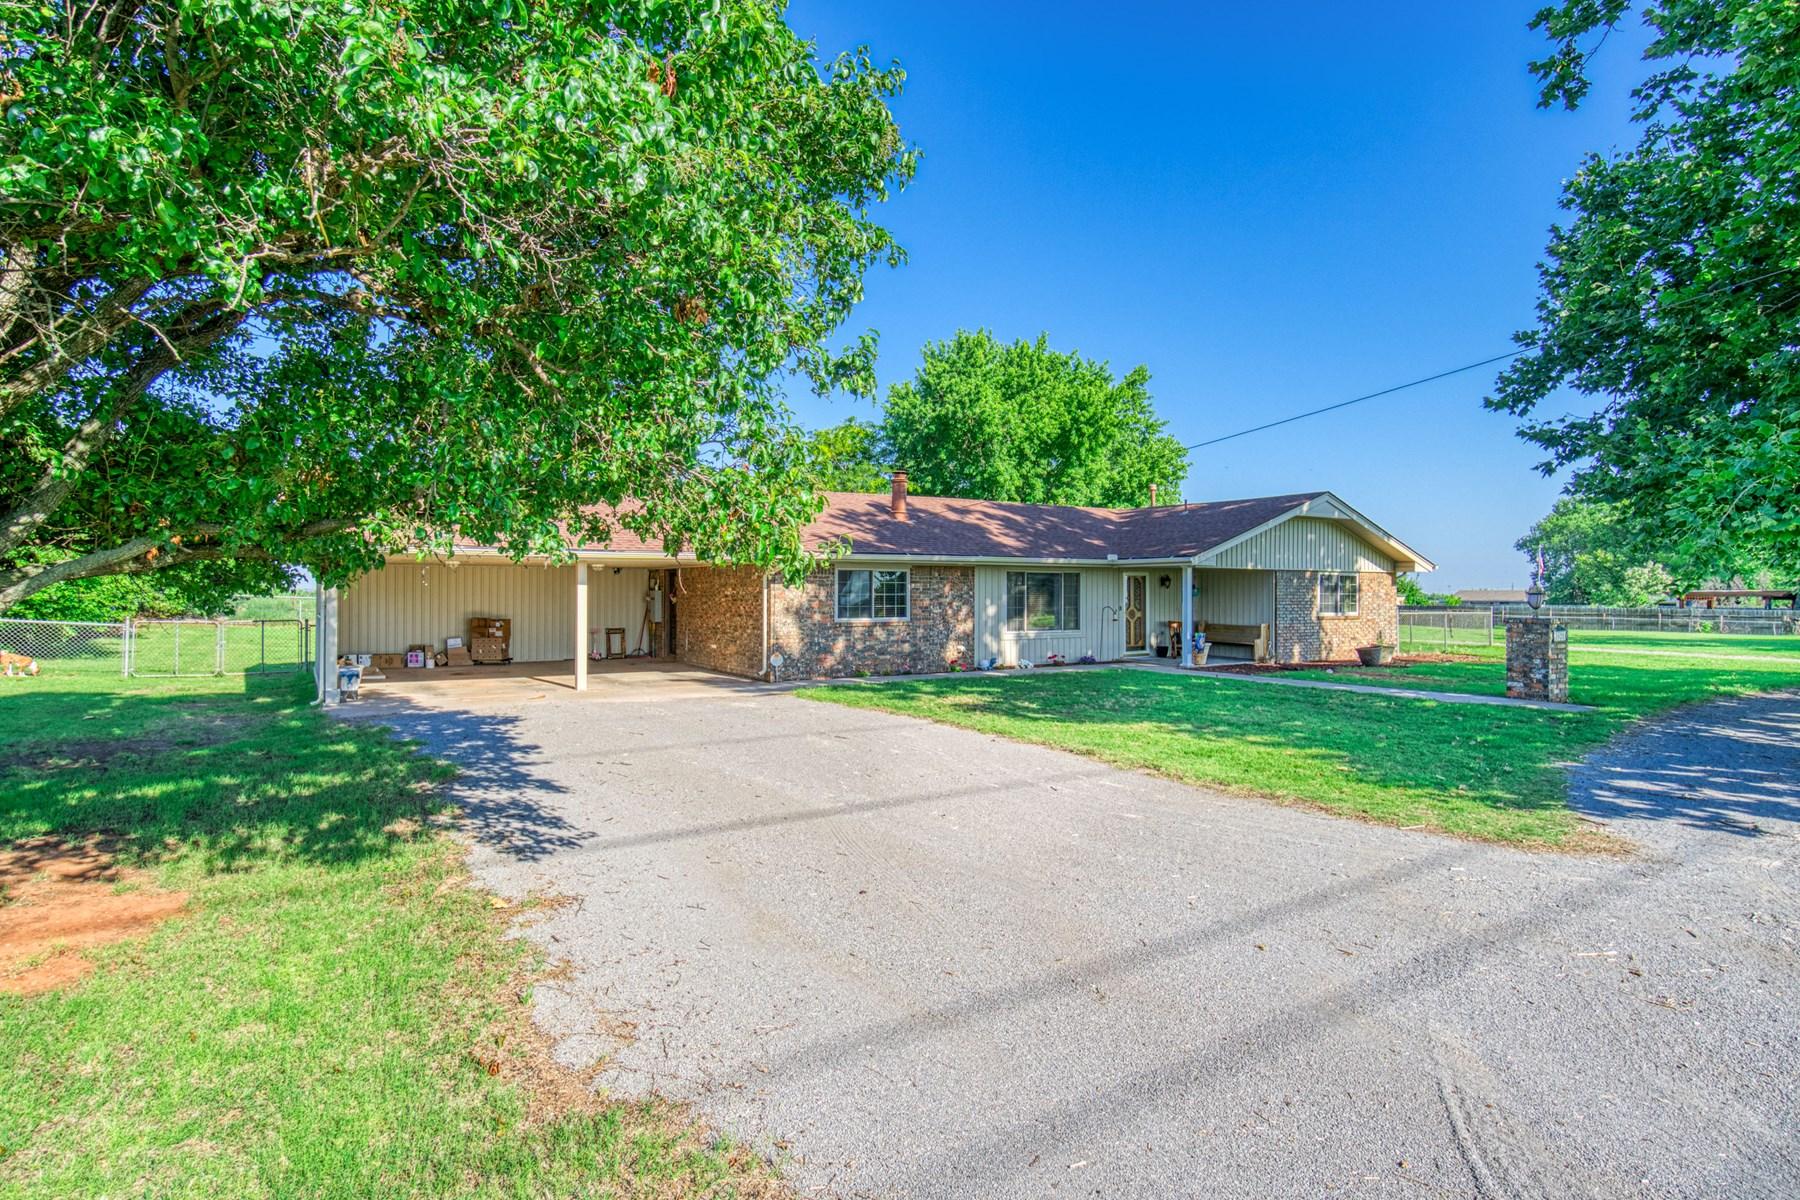 Western Oklahoma Country Home for Sale - Clinton, OK